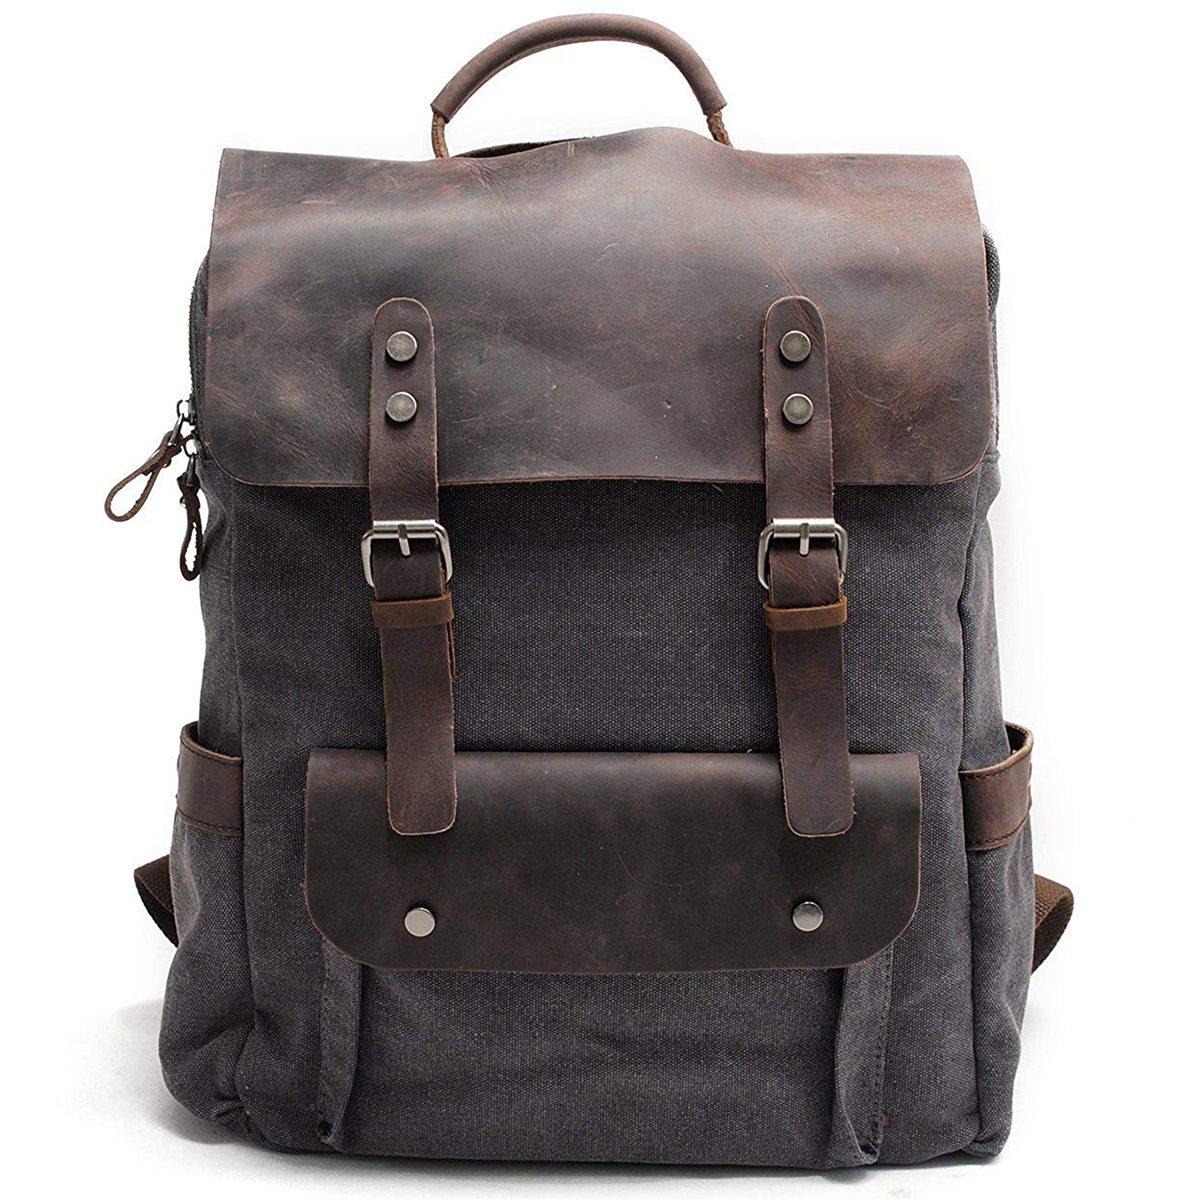 Men Leather Canvas Rucksack Laptop Backpack College School Bookbag(Dark Gray)Men Leather Canvas Rucksack Laptop Backpack College School Bookbag(Dark Gray)